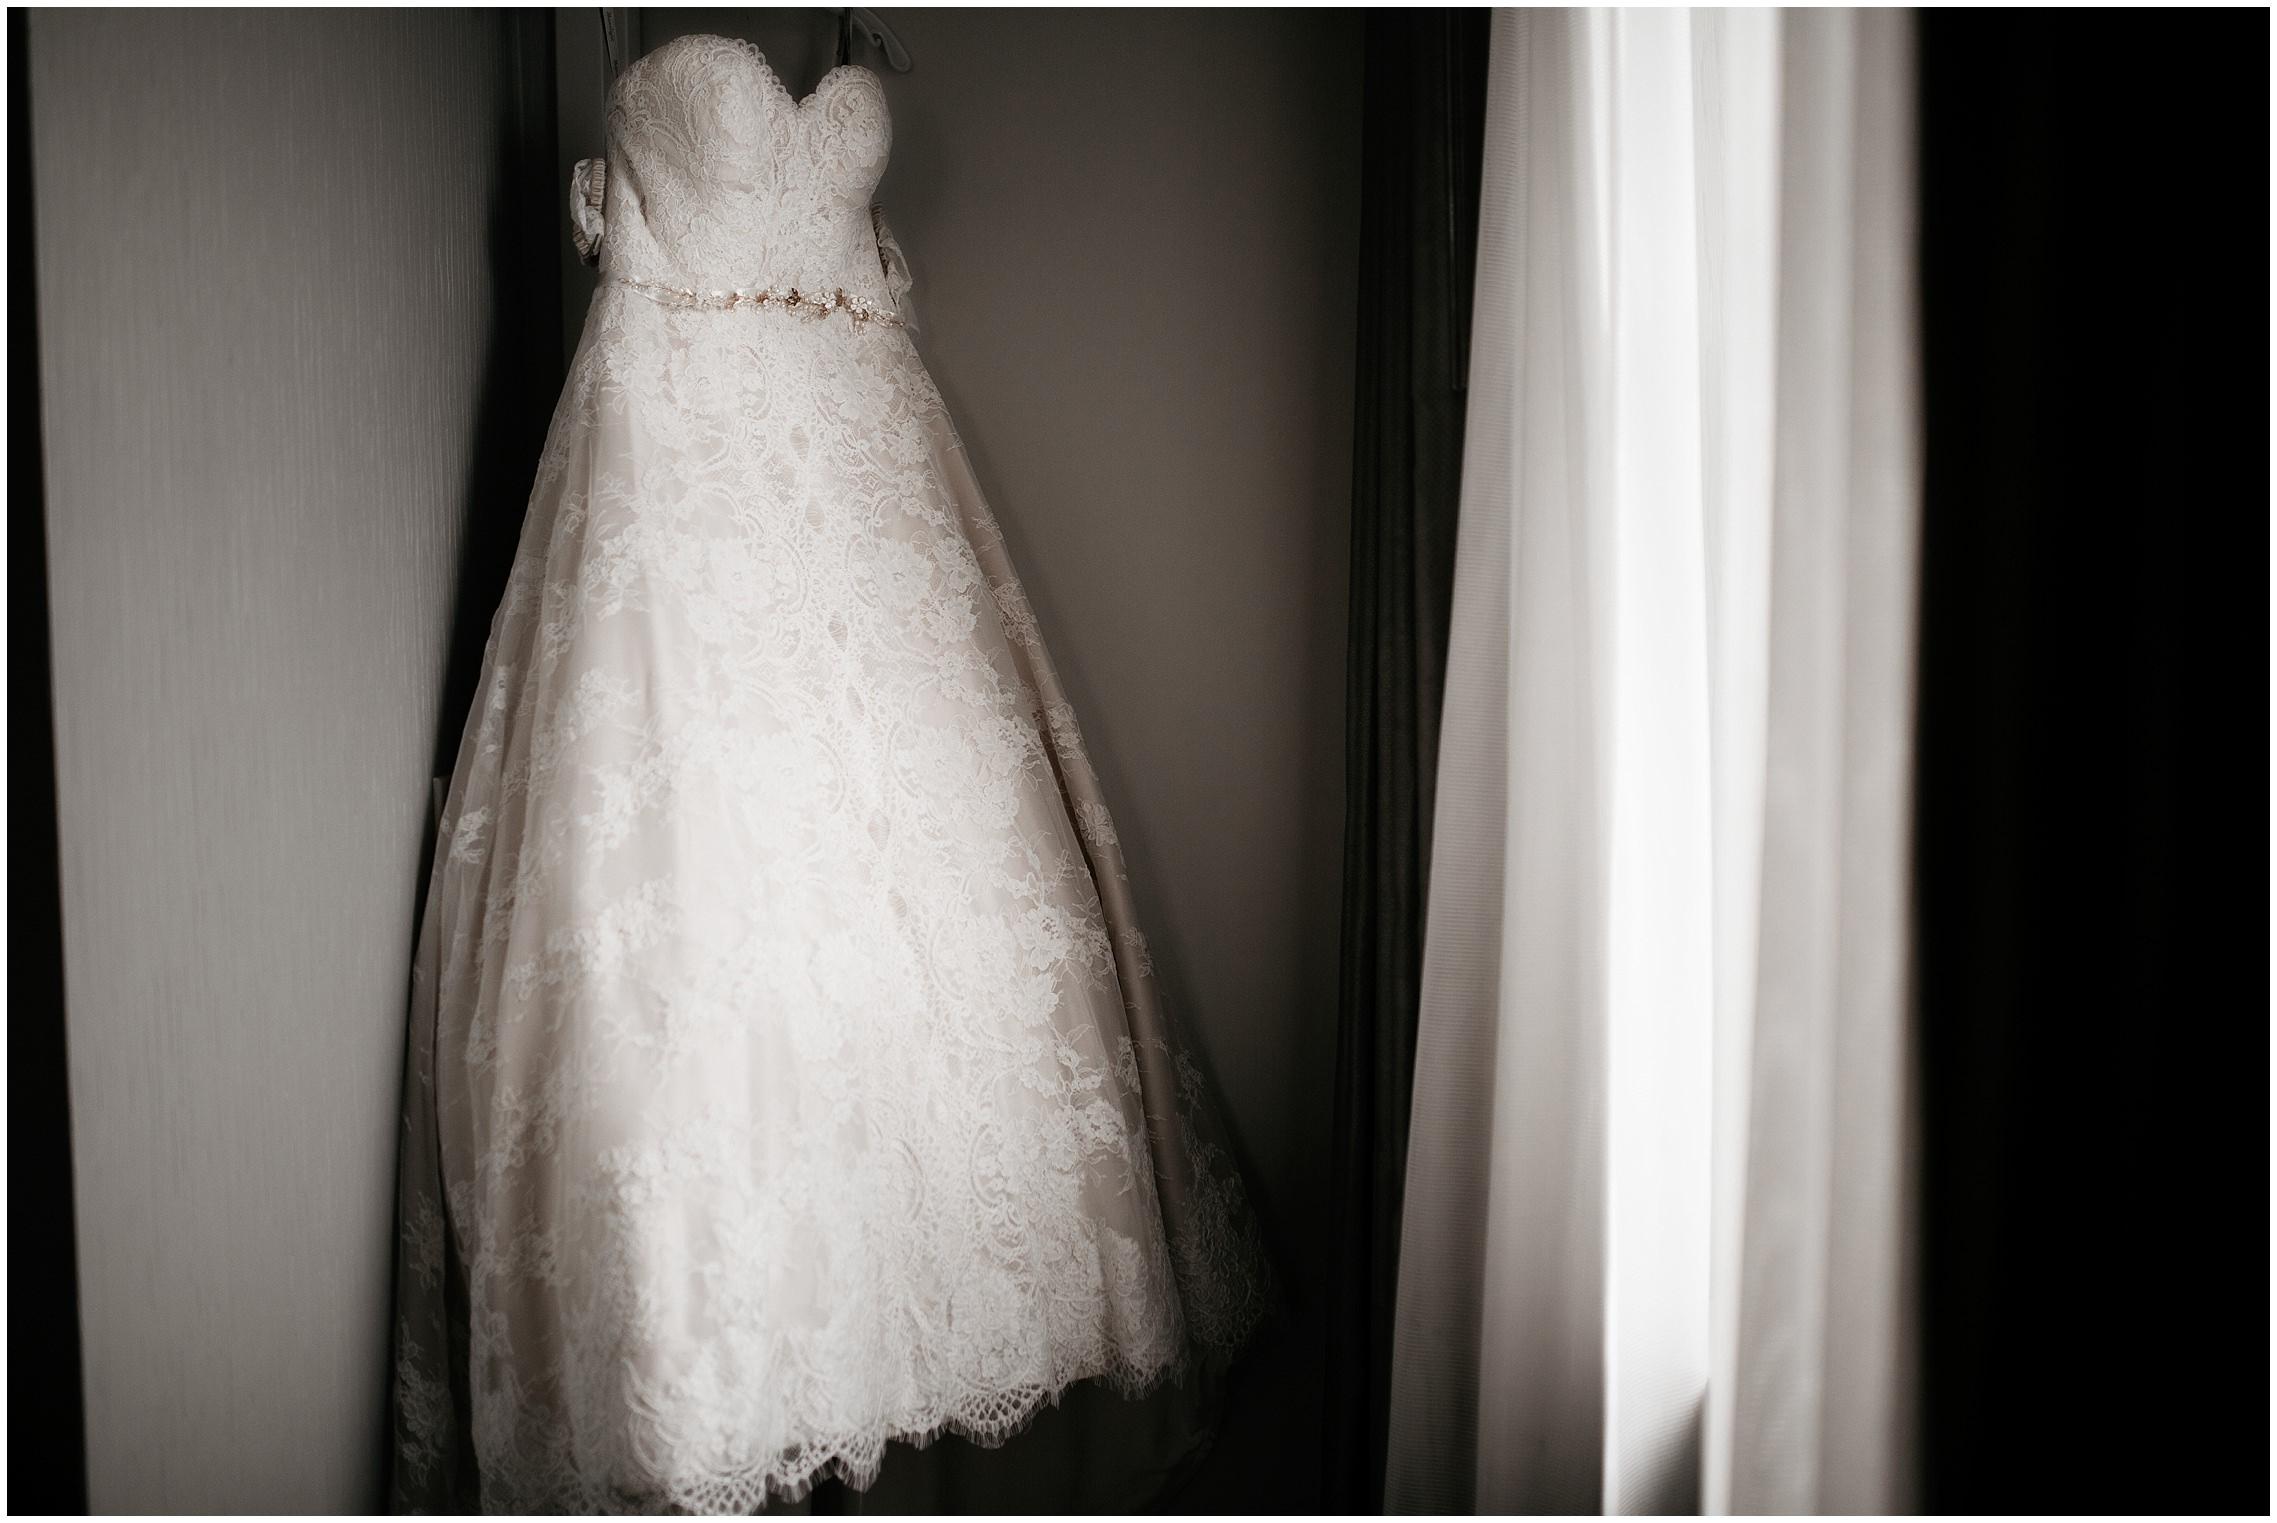 brick_and_mortar_colorado_wedding_photographer_0196.jpg